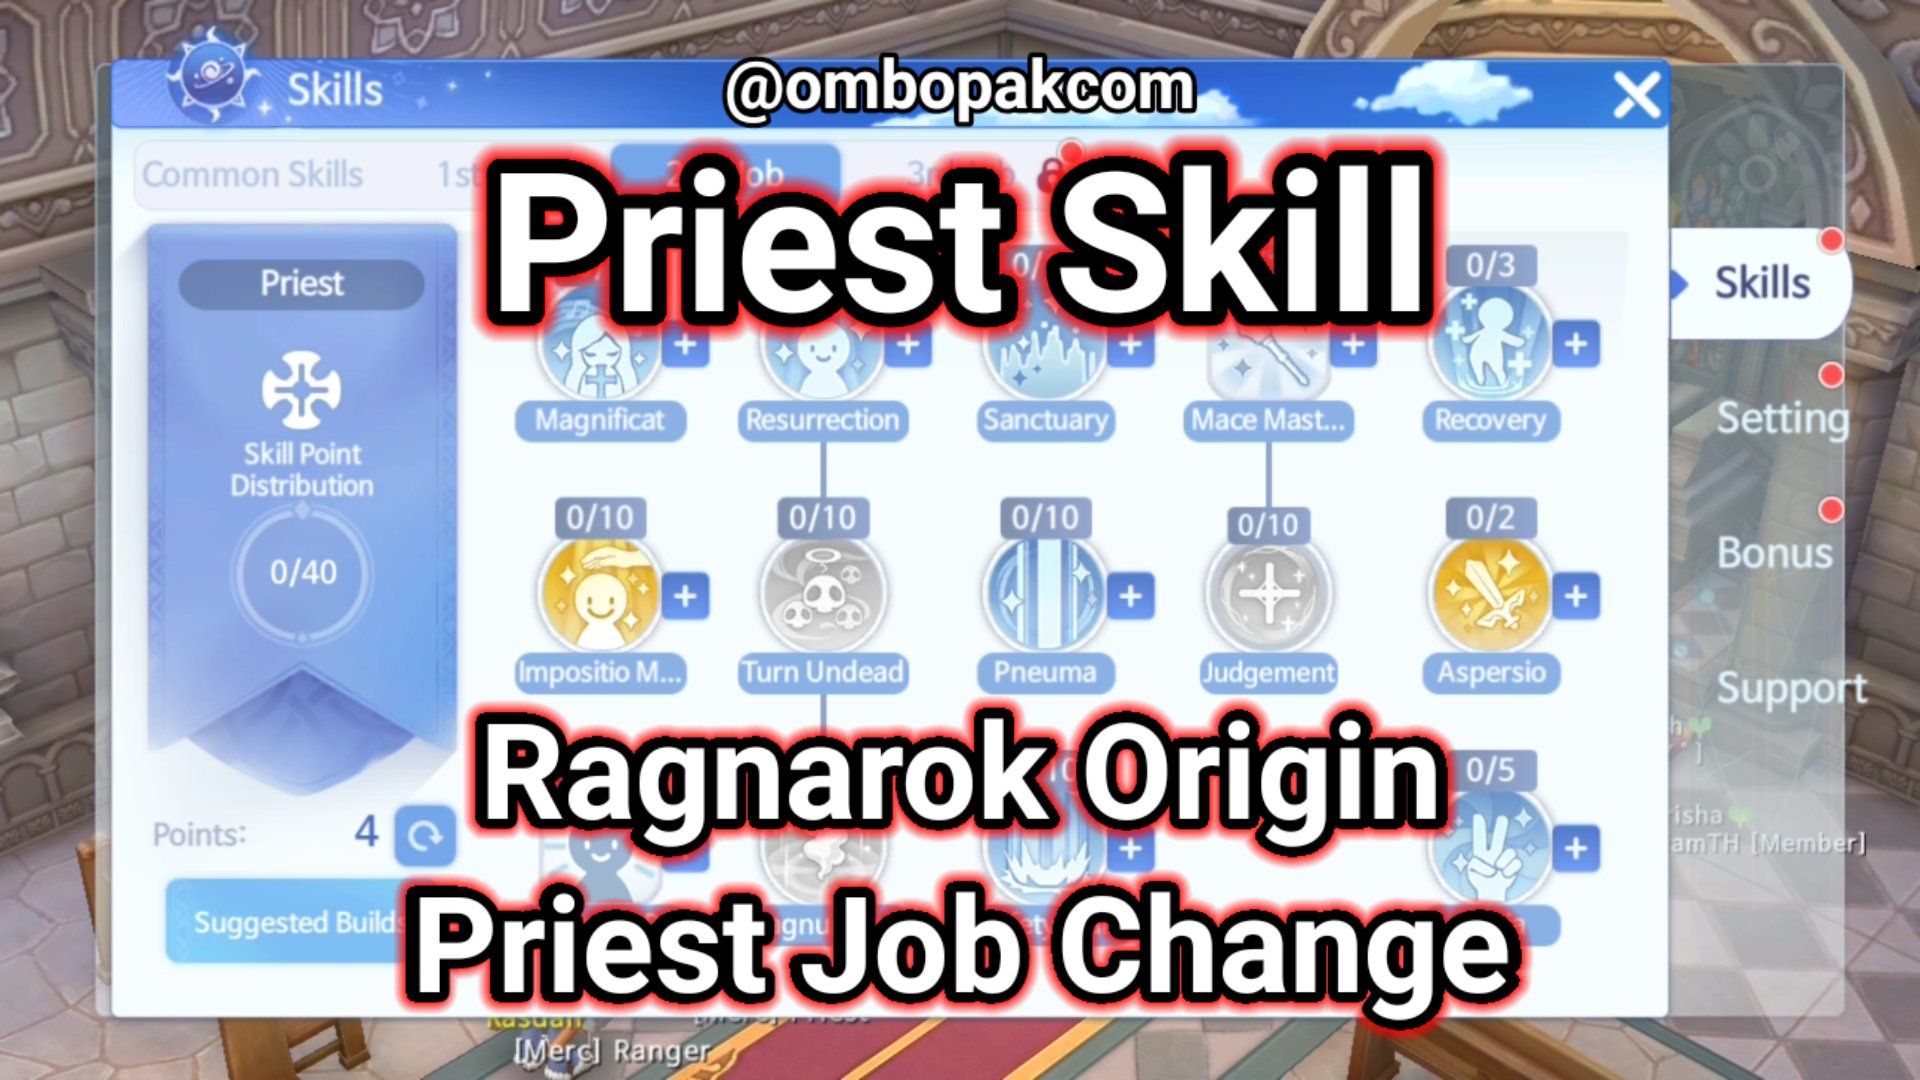 Priest Skill Ragnarok Origin ラグオリ   라그나로크 오리진 1